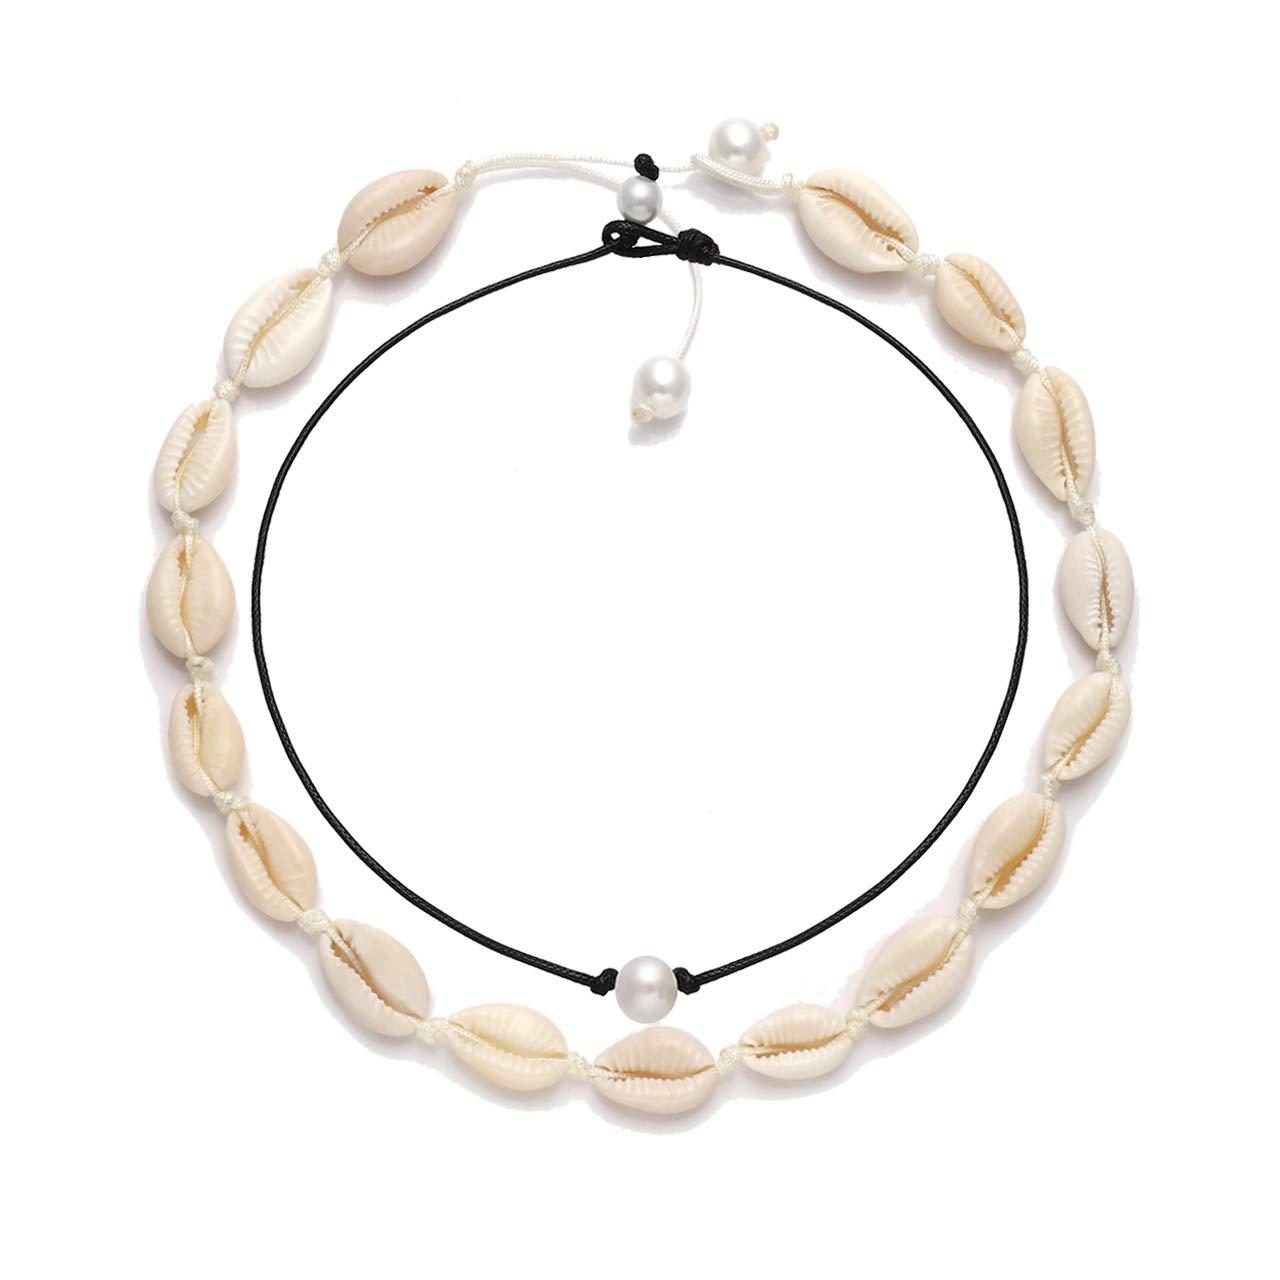 VUJANTIRY Cowrie Shell Choker Necklace for Women Hawaiian Seashell Pearls Choker Necklace Statement Adjustable Cord Necklace Set (Shell&Pearls Choker #1)